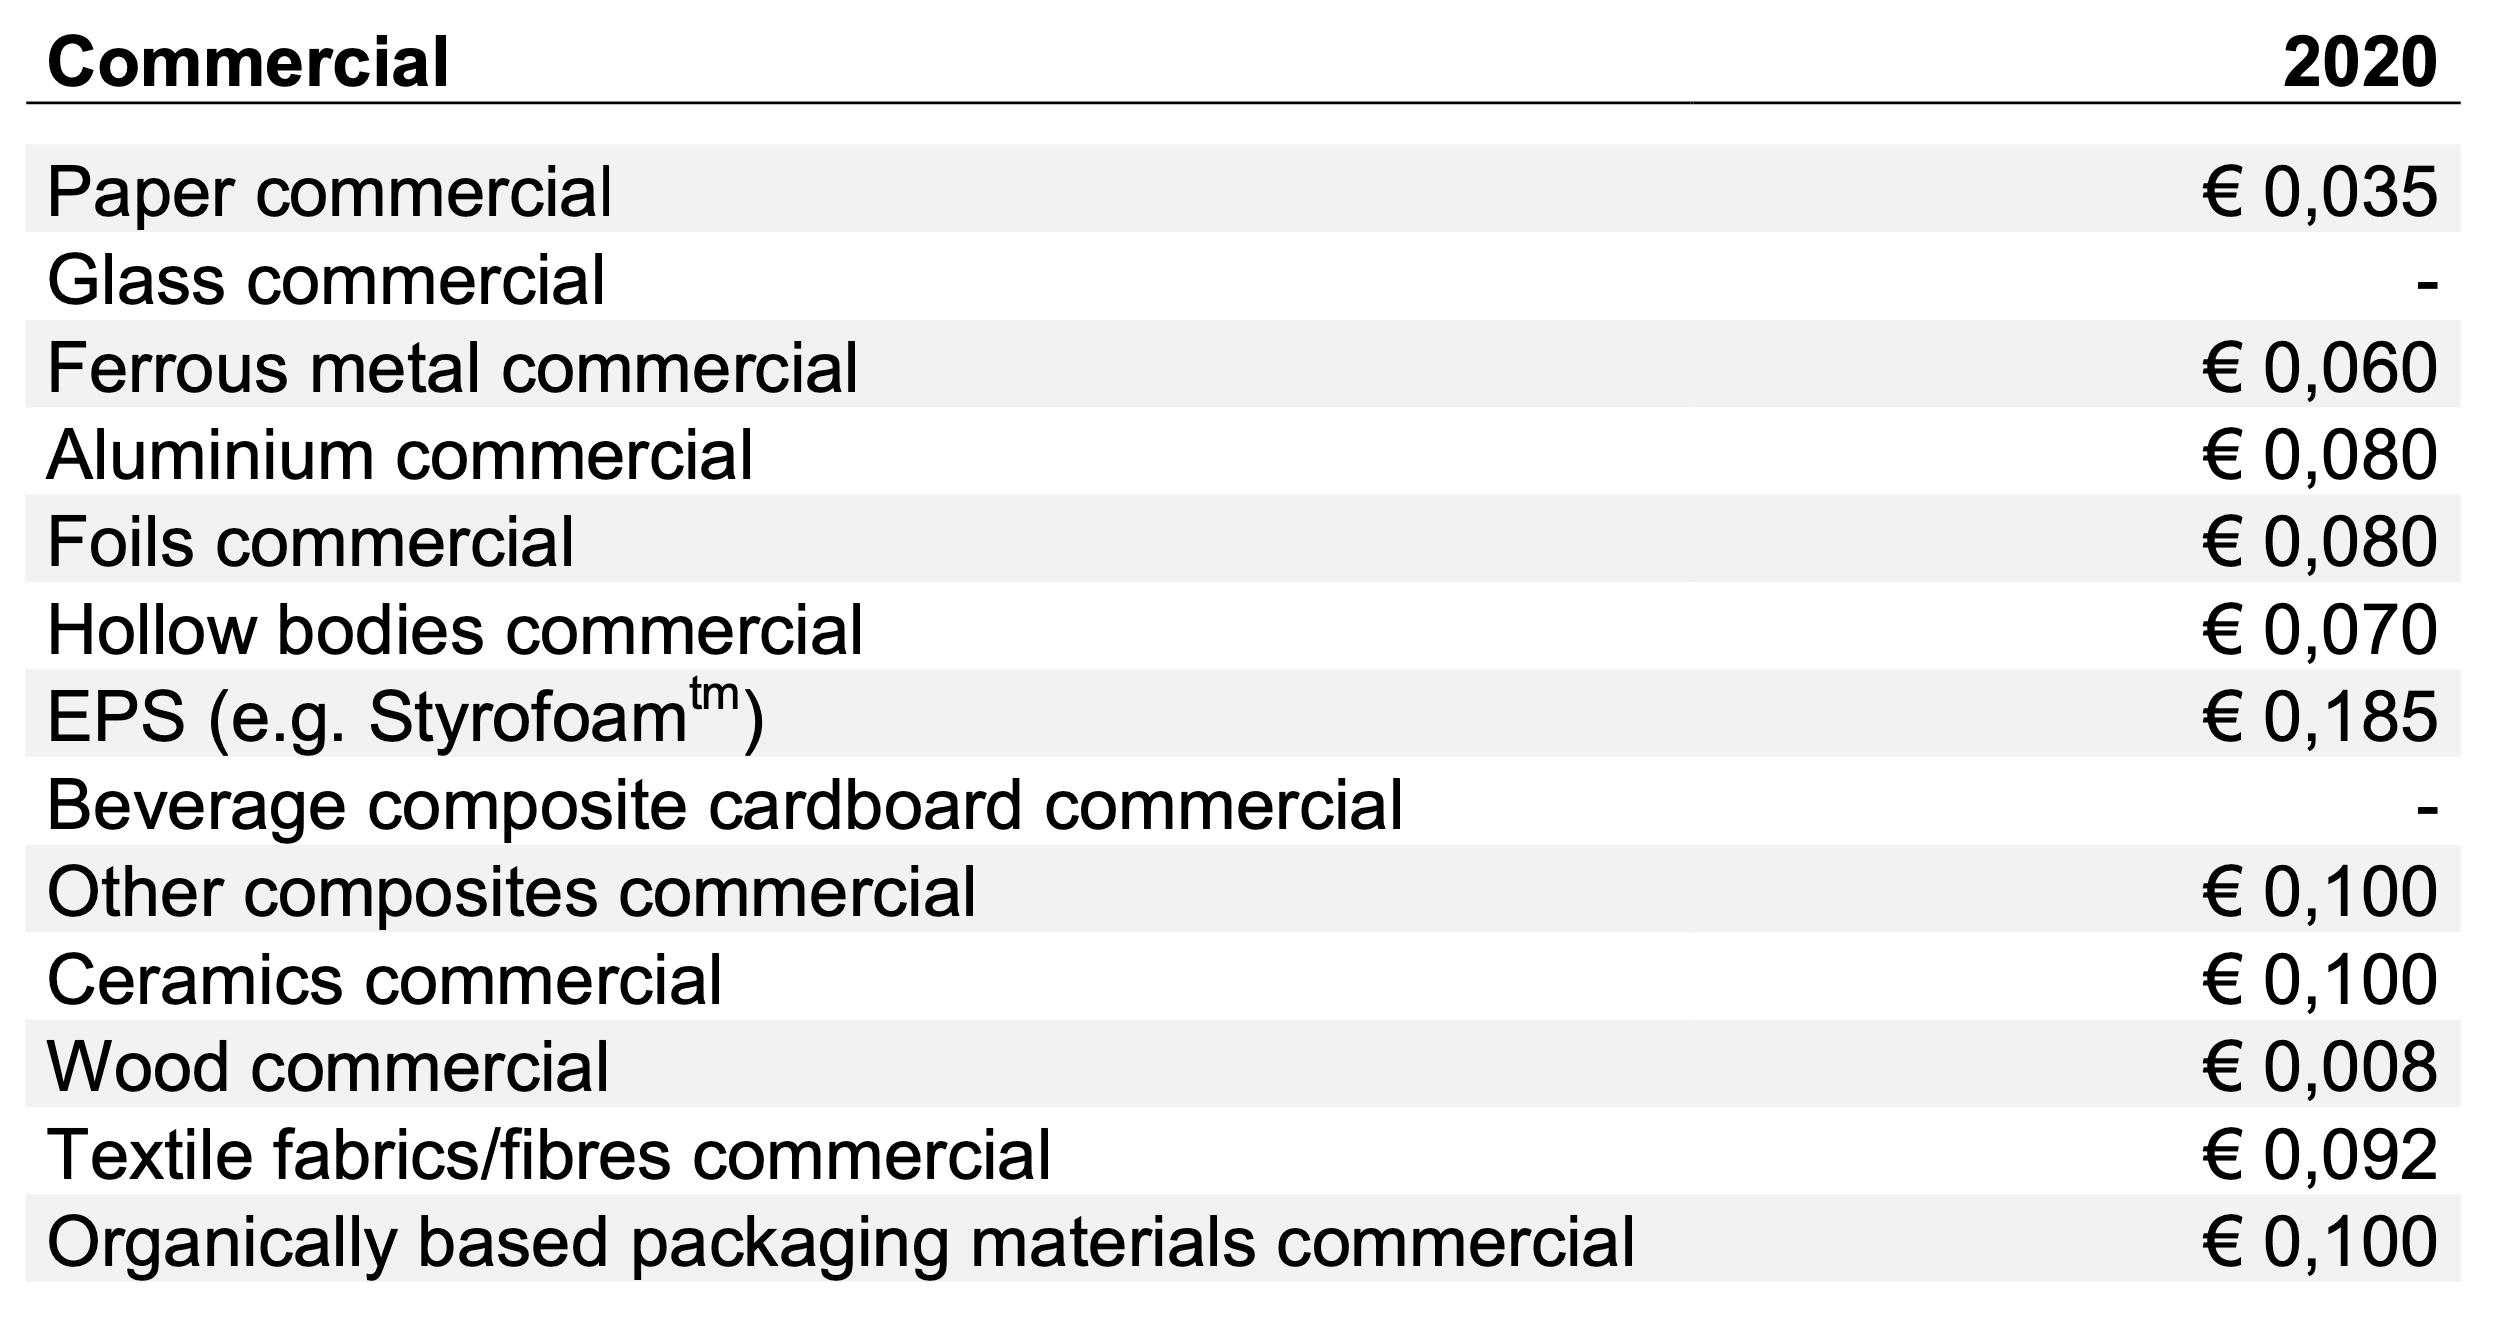 Verwerkingskosten VerpackG verpakkingsbelasting